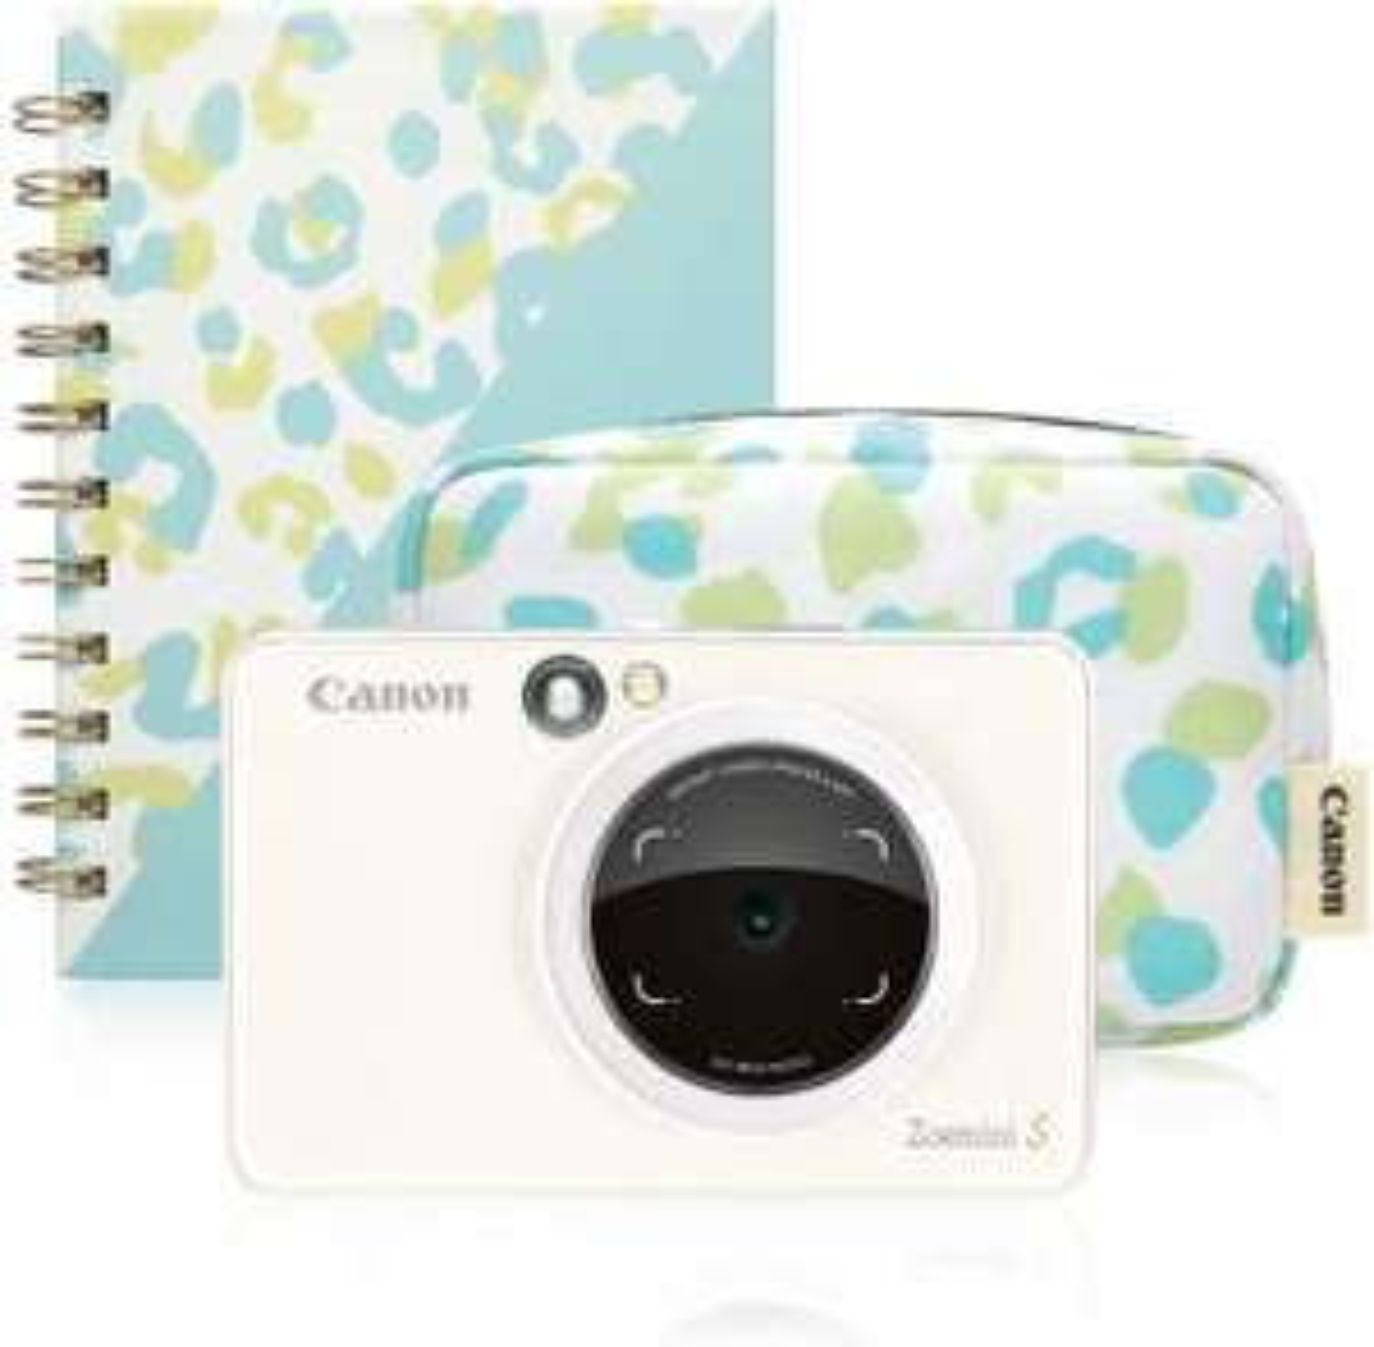 Canon Zoemini S Instant Camera & Photo Printer Used Like New £50.18 Amazon Warehouse Prime Exclusive